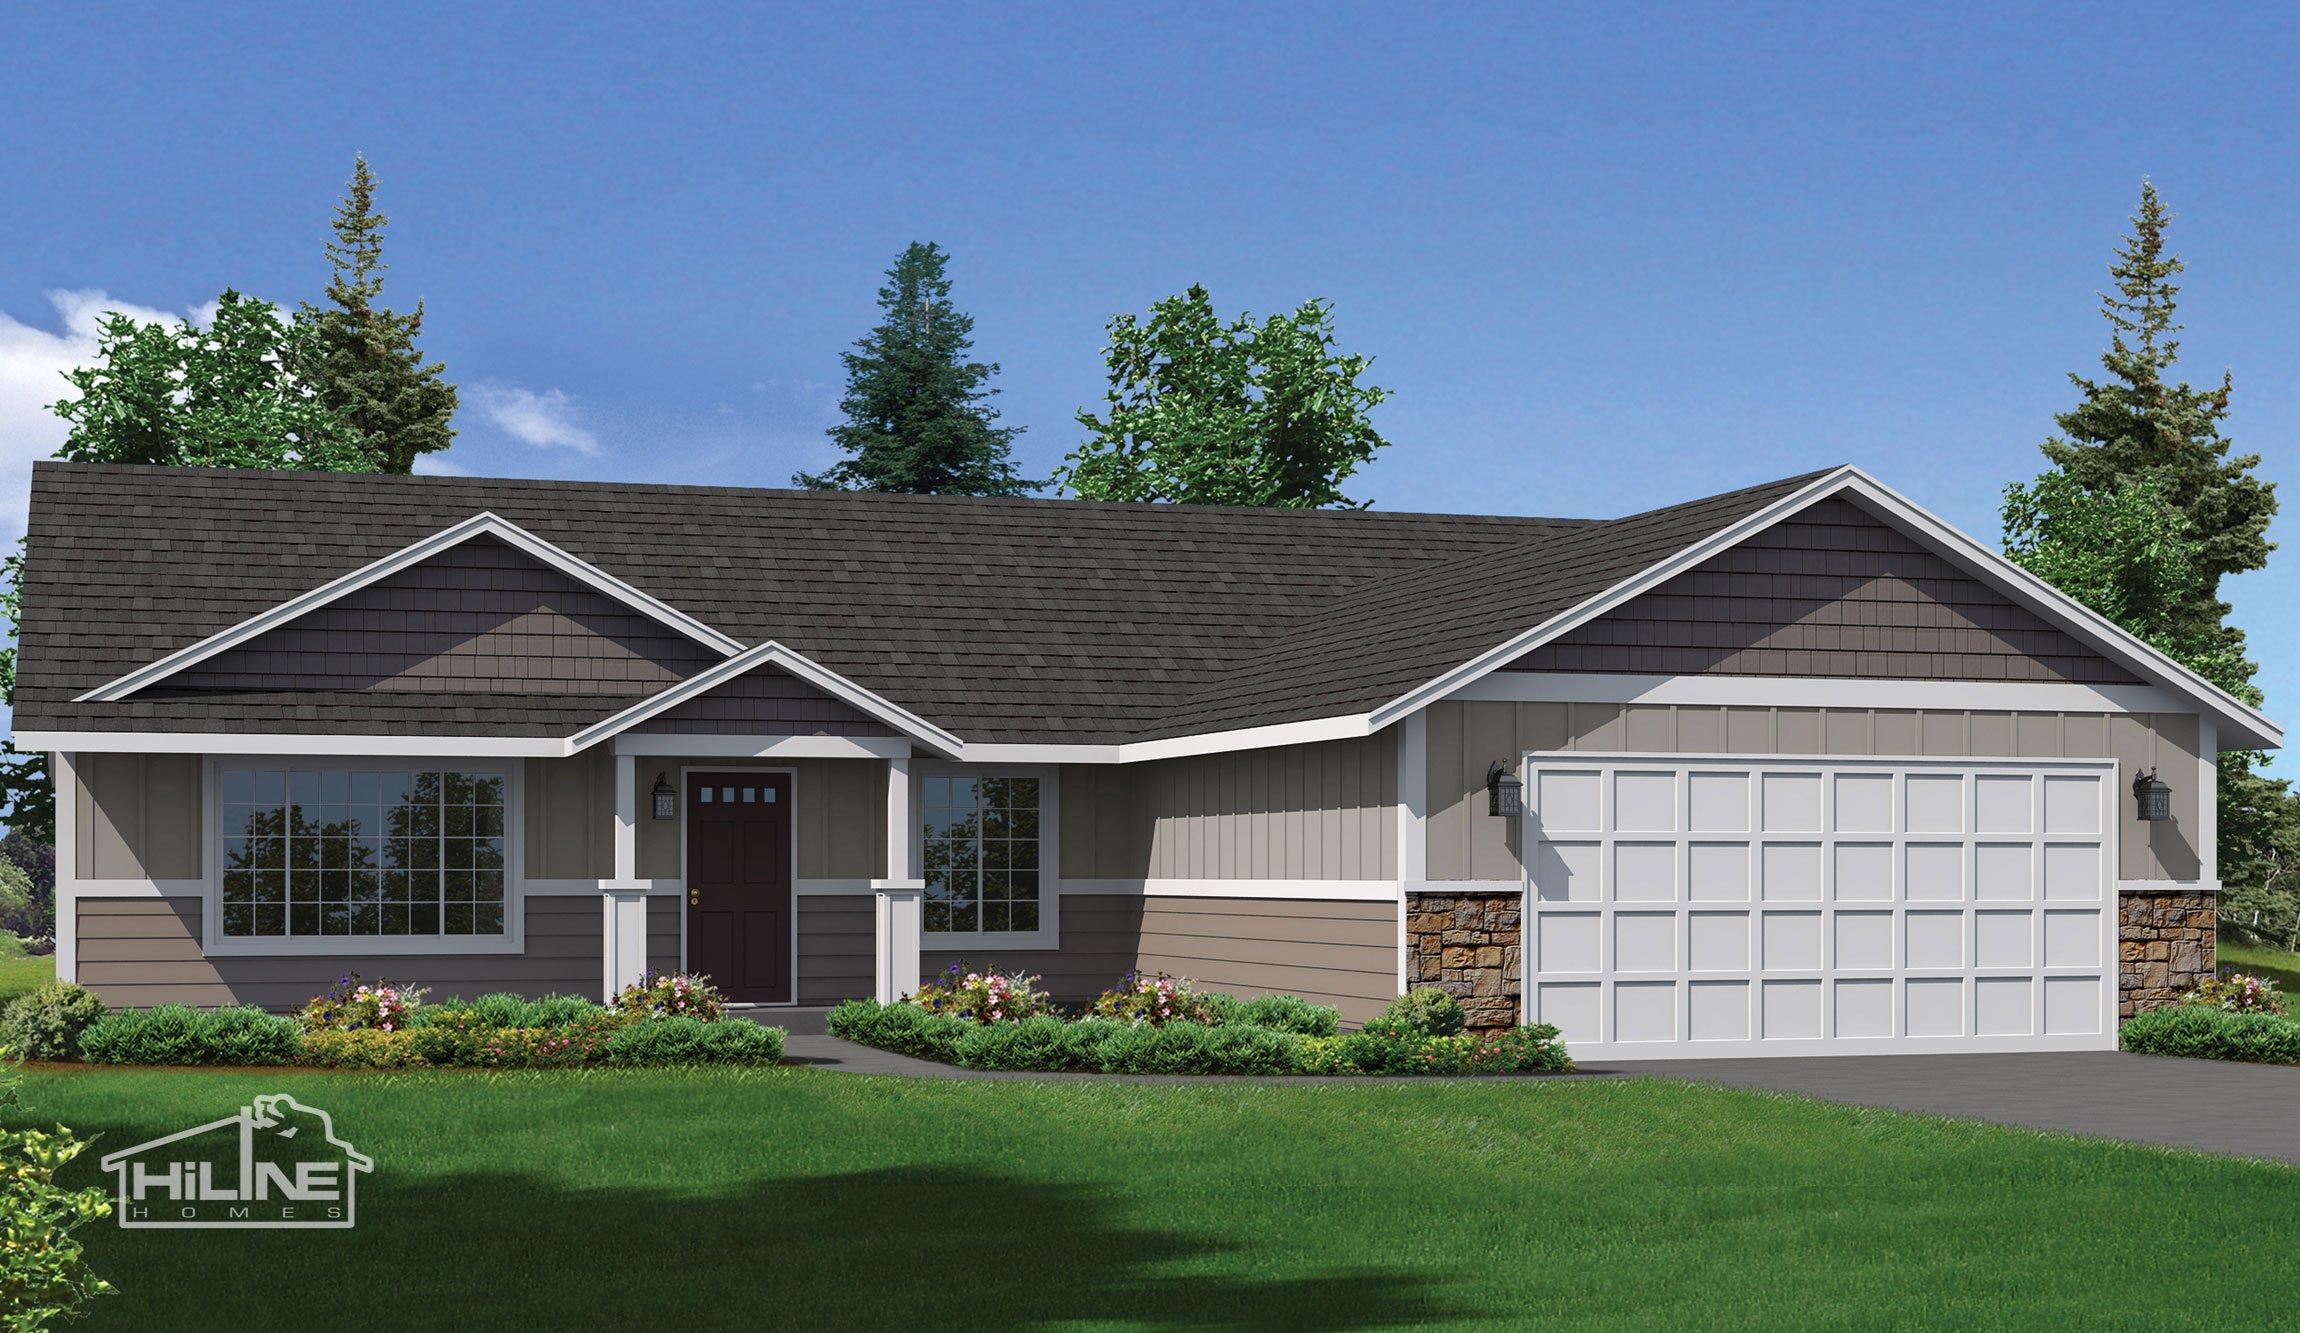 Image of Home Plan 1664 Rendering